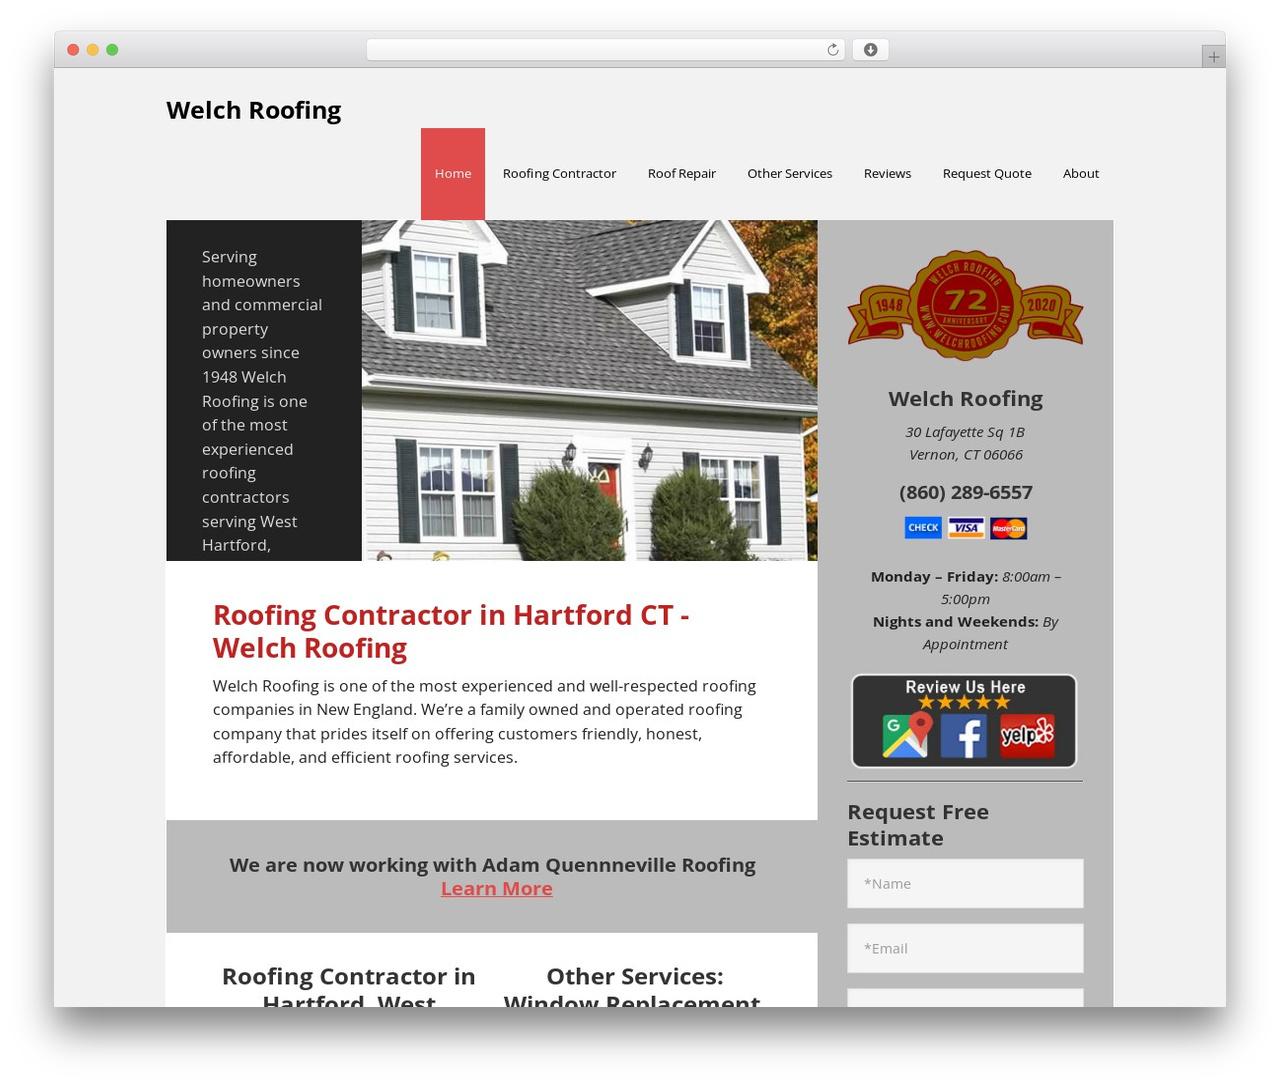 WordPress theme Executive Pro Theme - welchroofing.com